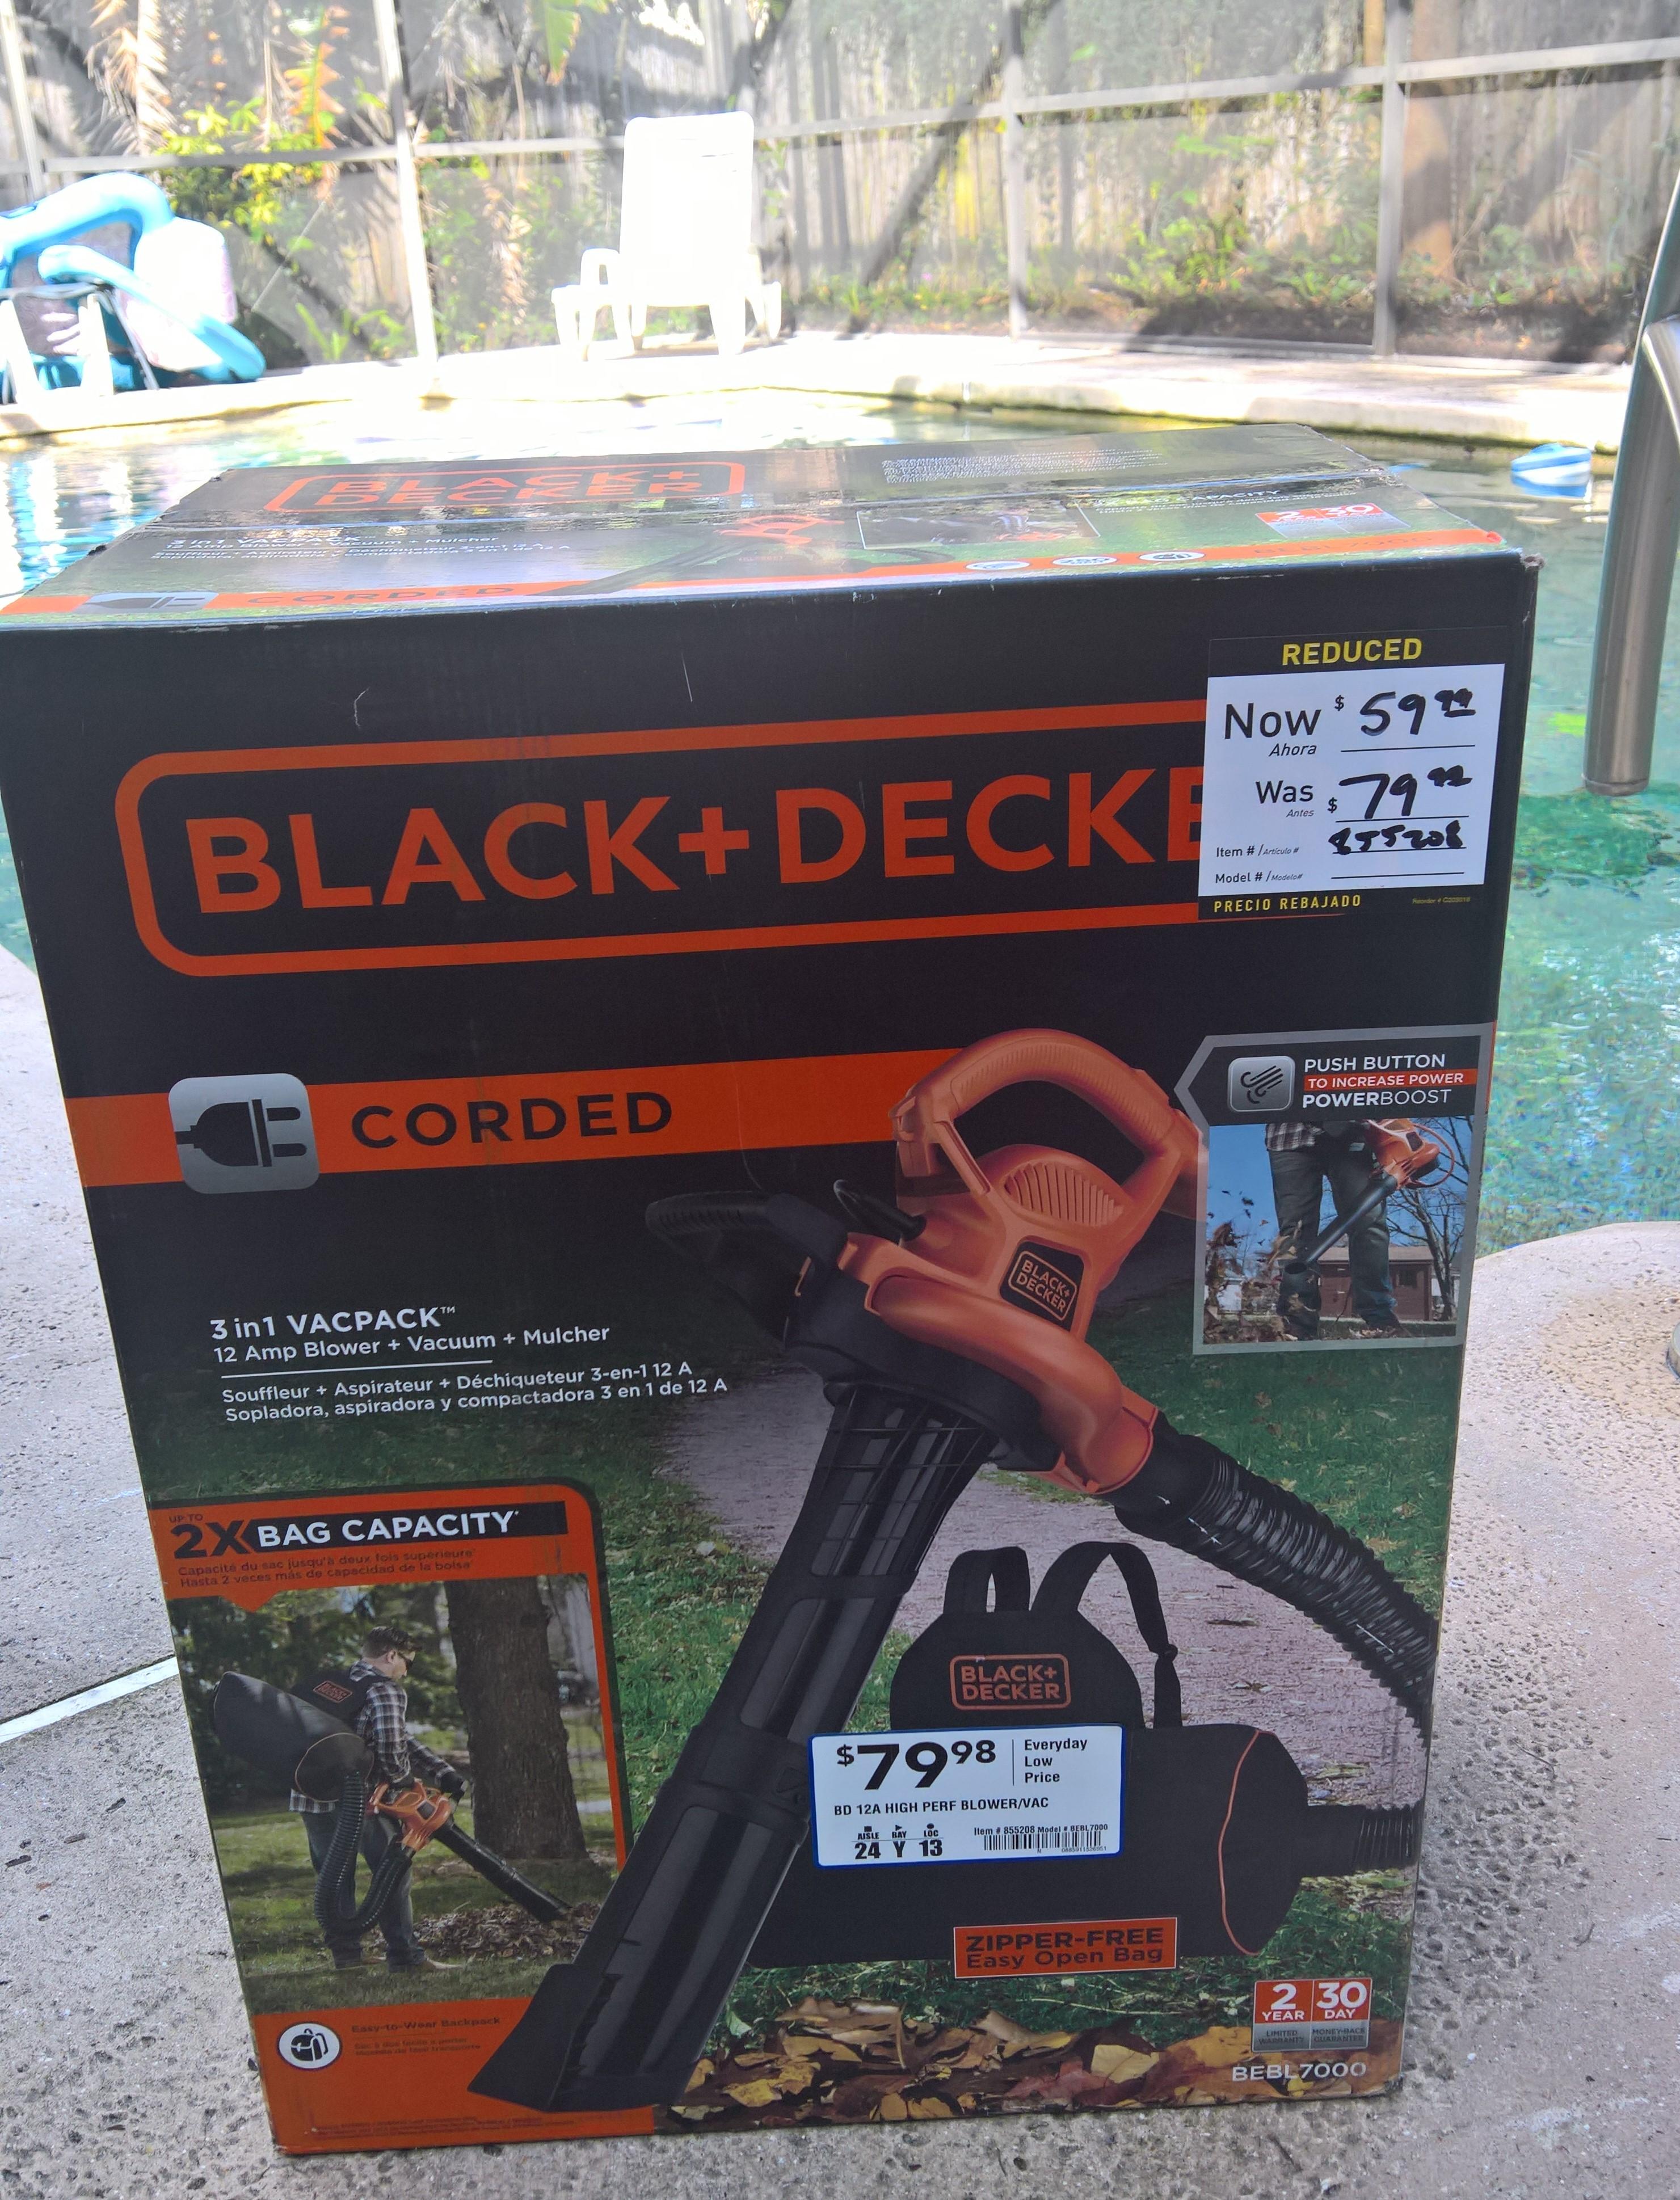 Black+Decker Corded 12A Leaf Blower/Vacuum Lowe's In-Store  (YMMV) $59